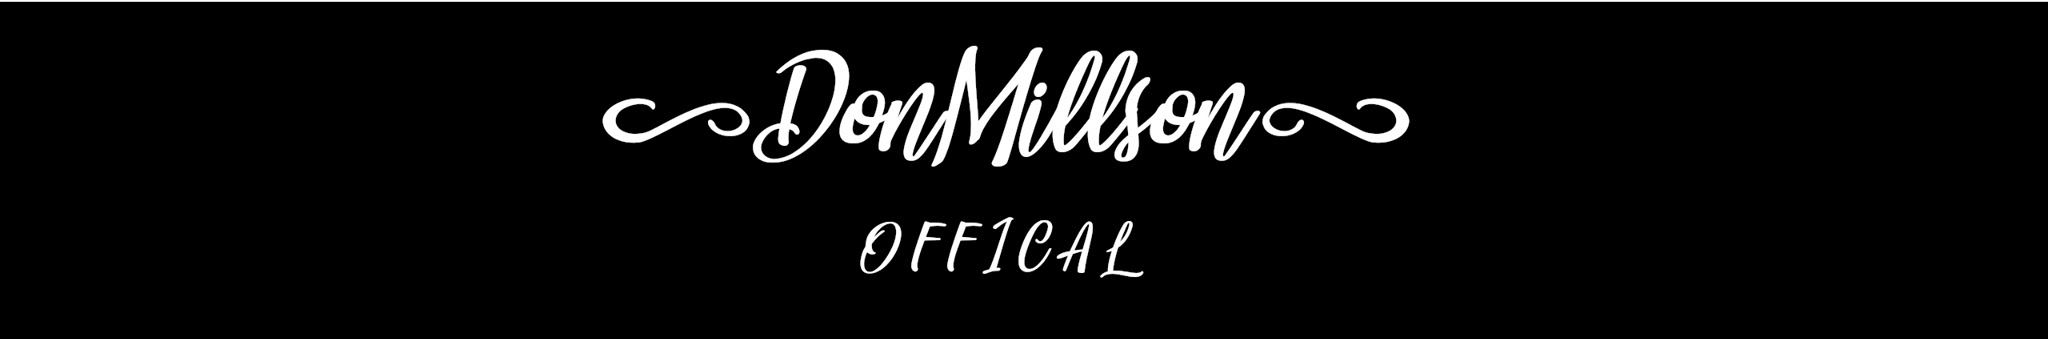 DonMillson